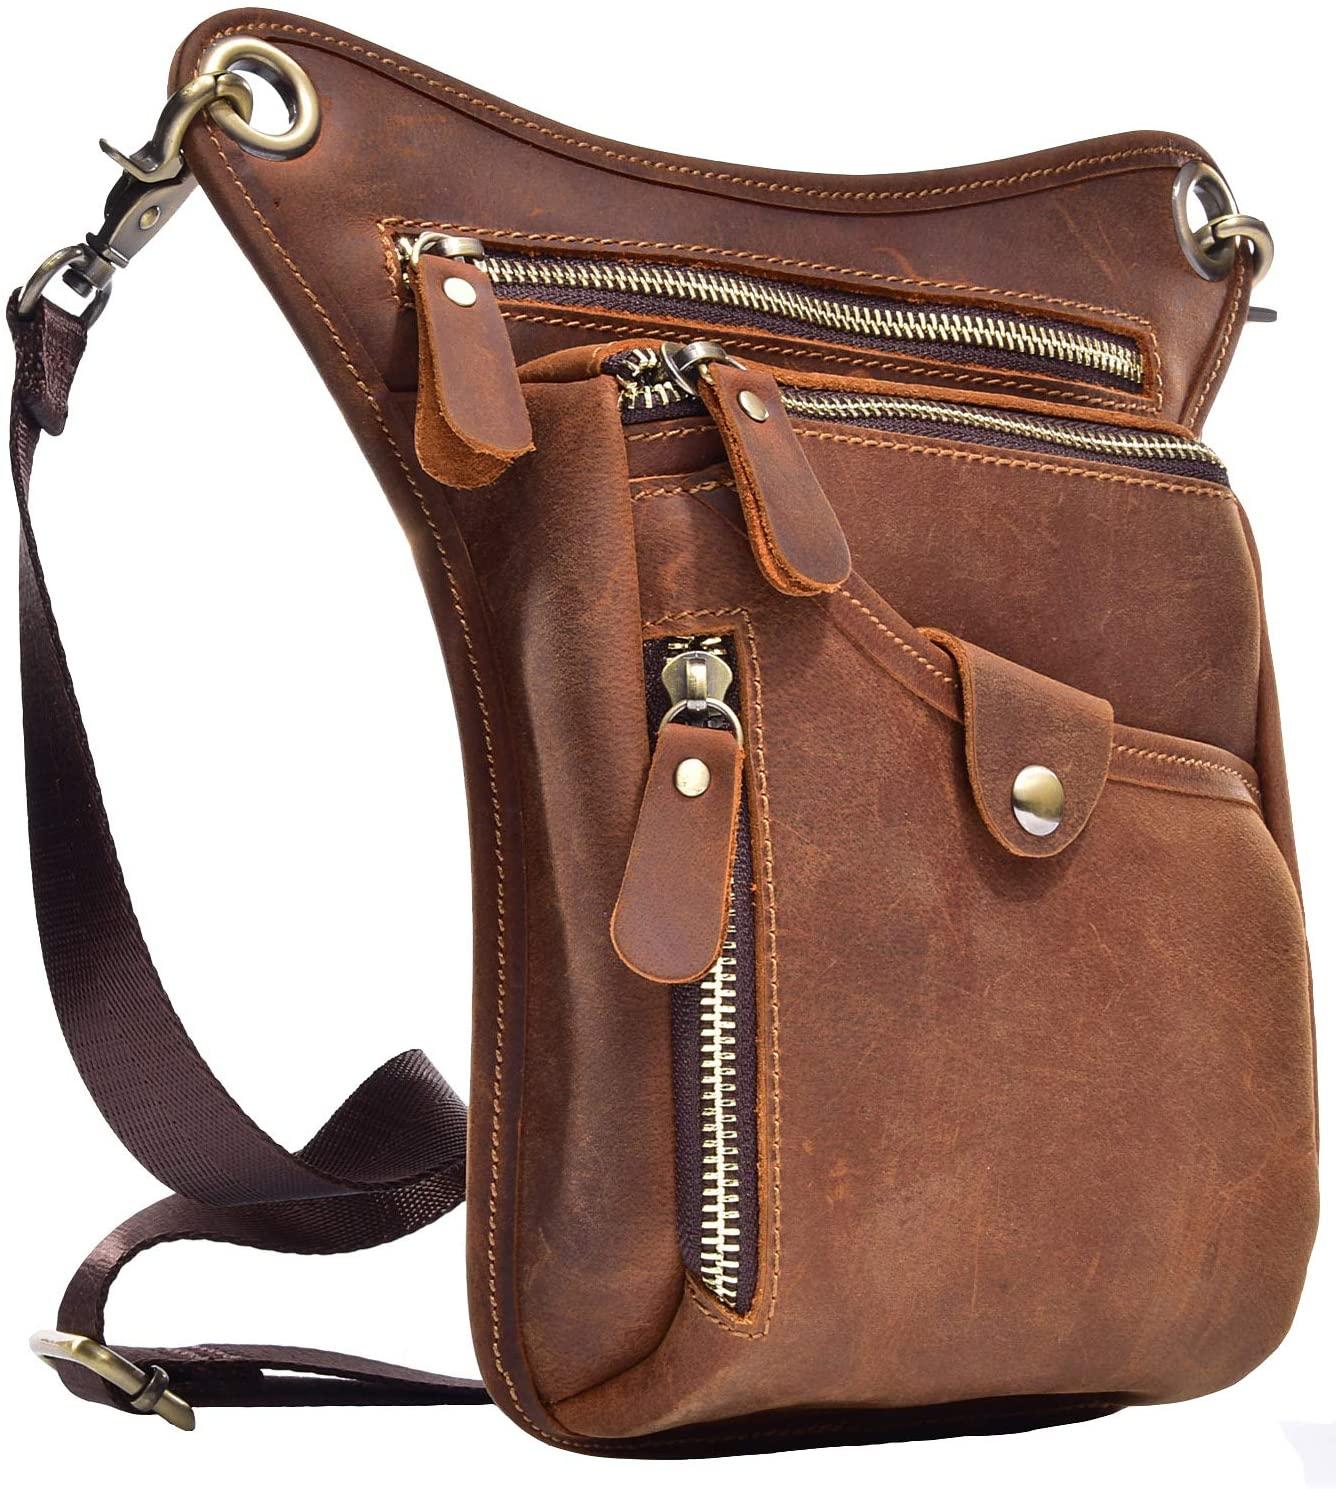 SEABIRD Messenger Leather Fanny Pack for Men Waterproof Supreme Motorcycle Waist Drop Leg Bag